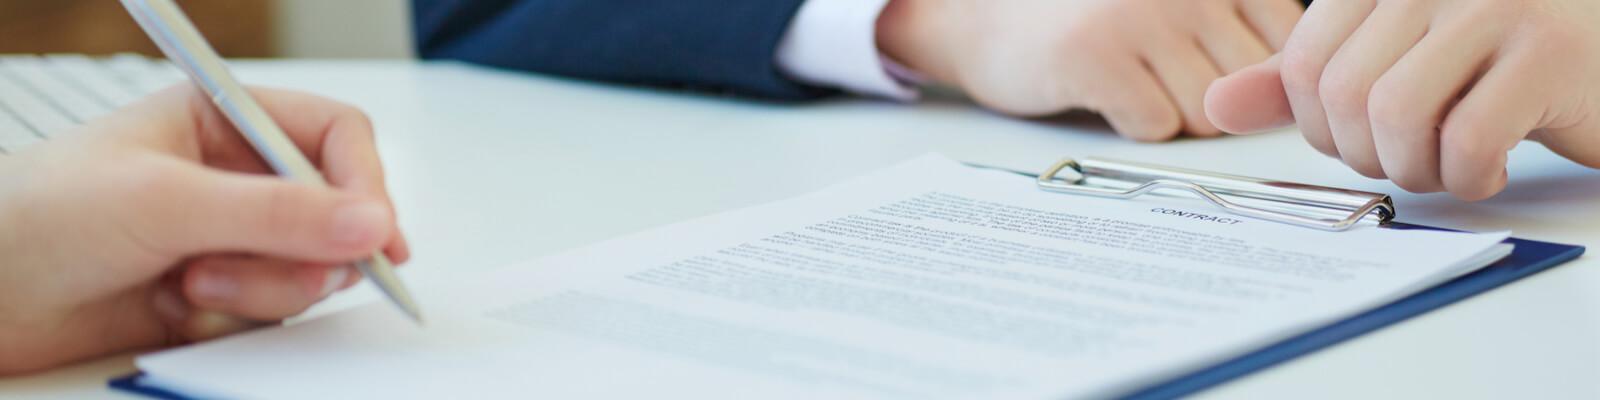 sba loan process - feature image